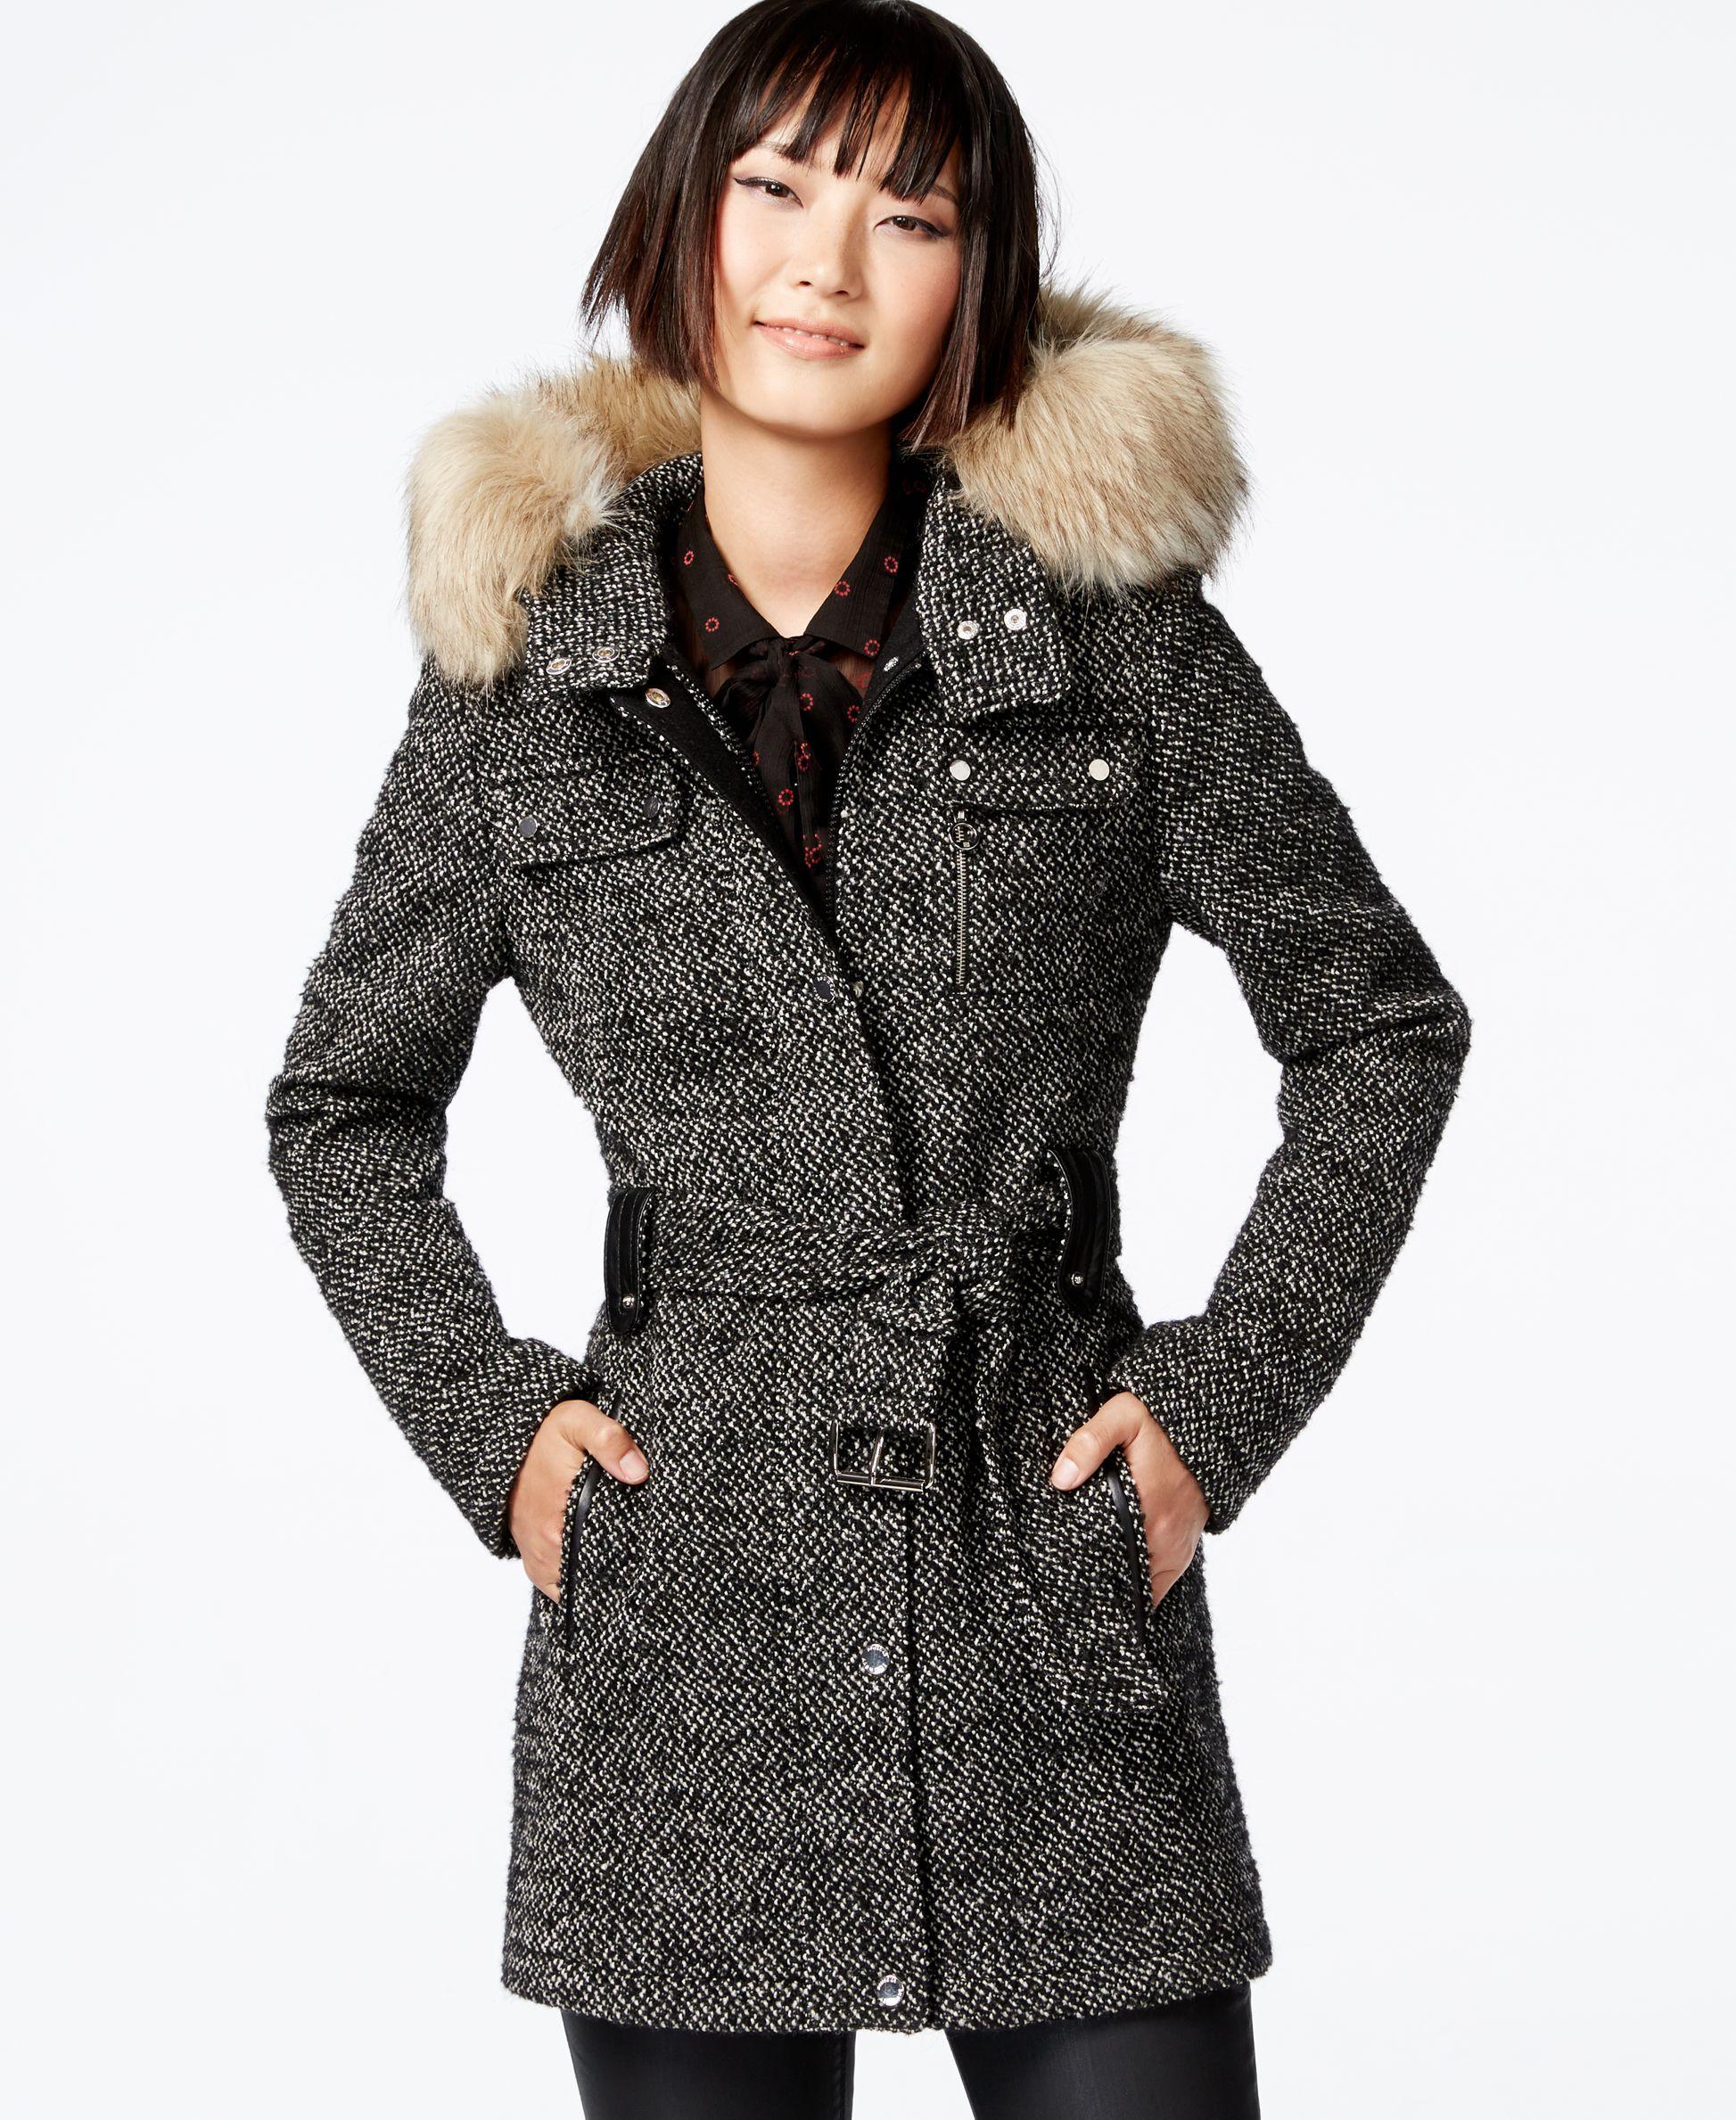 Laundry By Design Faux Fur Trim Utility Coat Coat Coats For Women Cute Coats